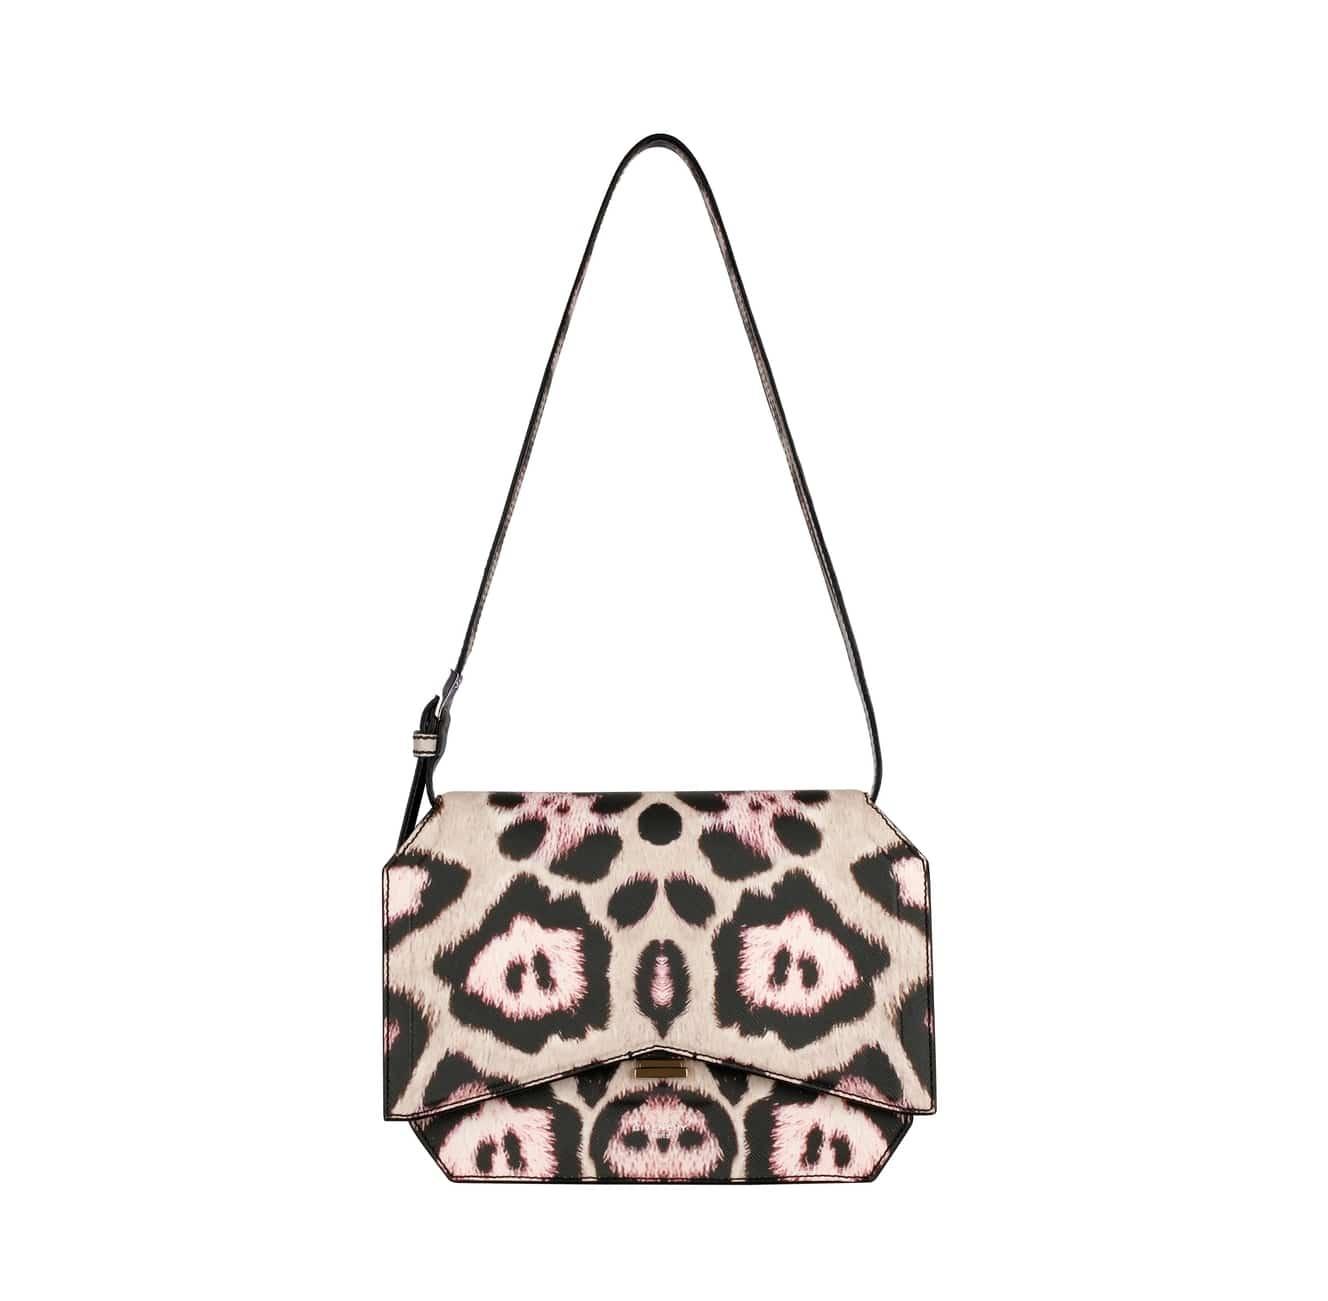 neck pin enamel by jewel real jaguar handbags handbag d and enzo leather with zooielli fur amato designer